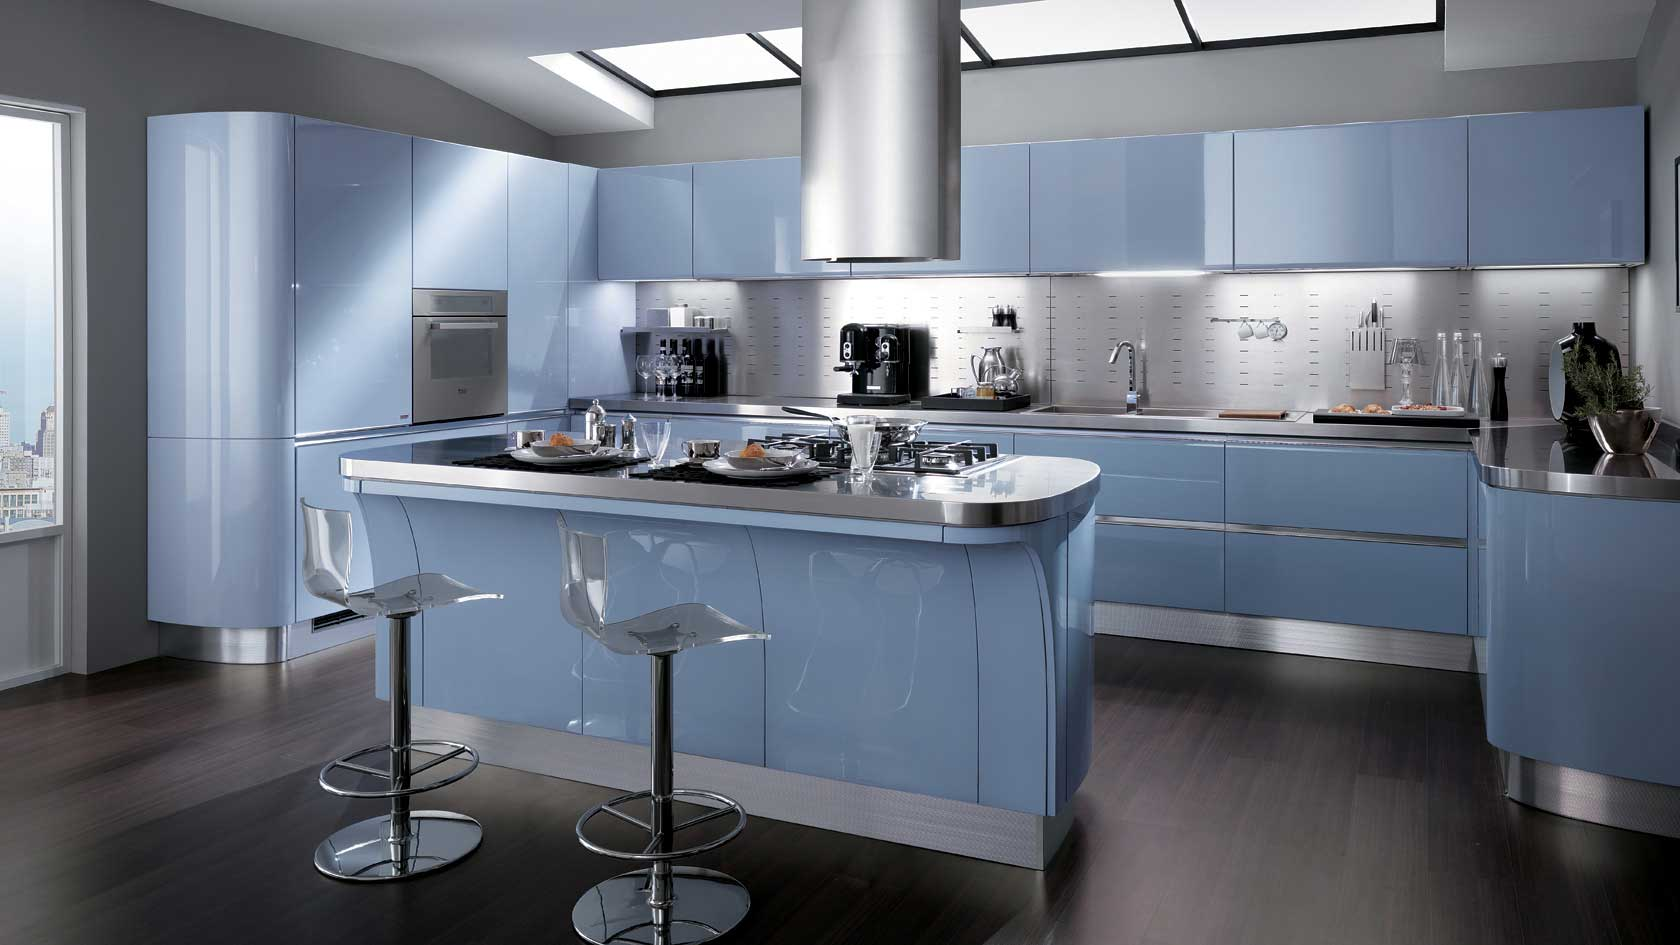 Scavolini | Tess Kitchen by Silvano Barsacchi | Wood - Furniture.biz